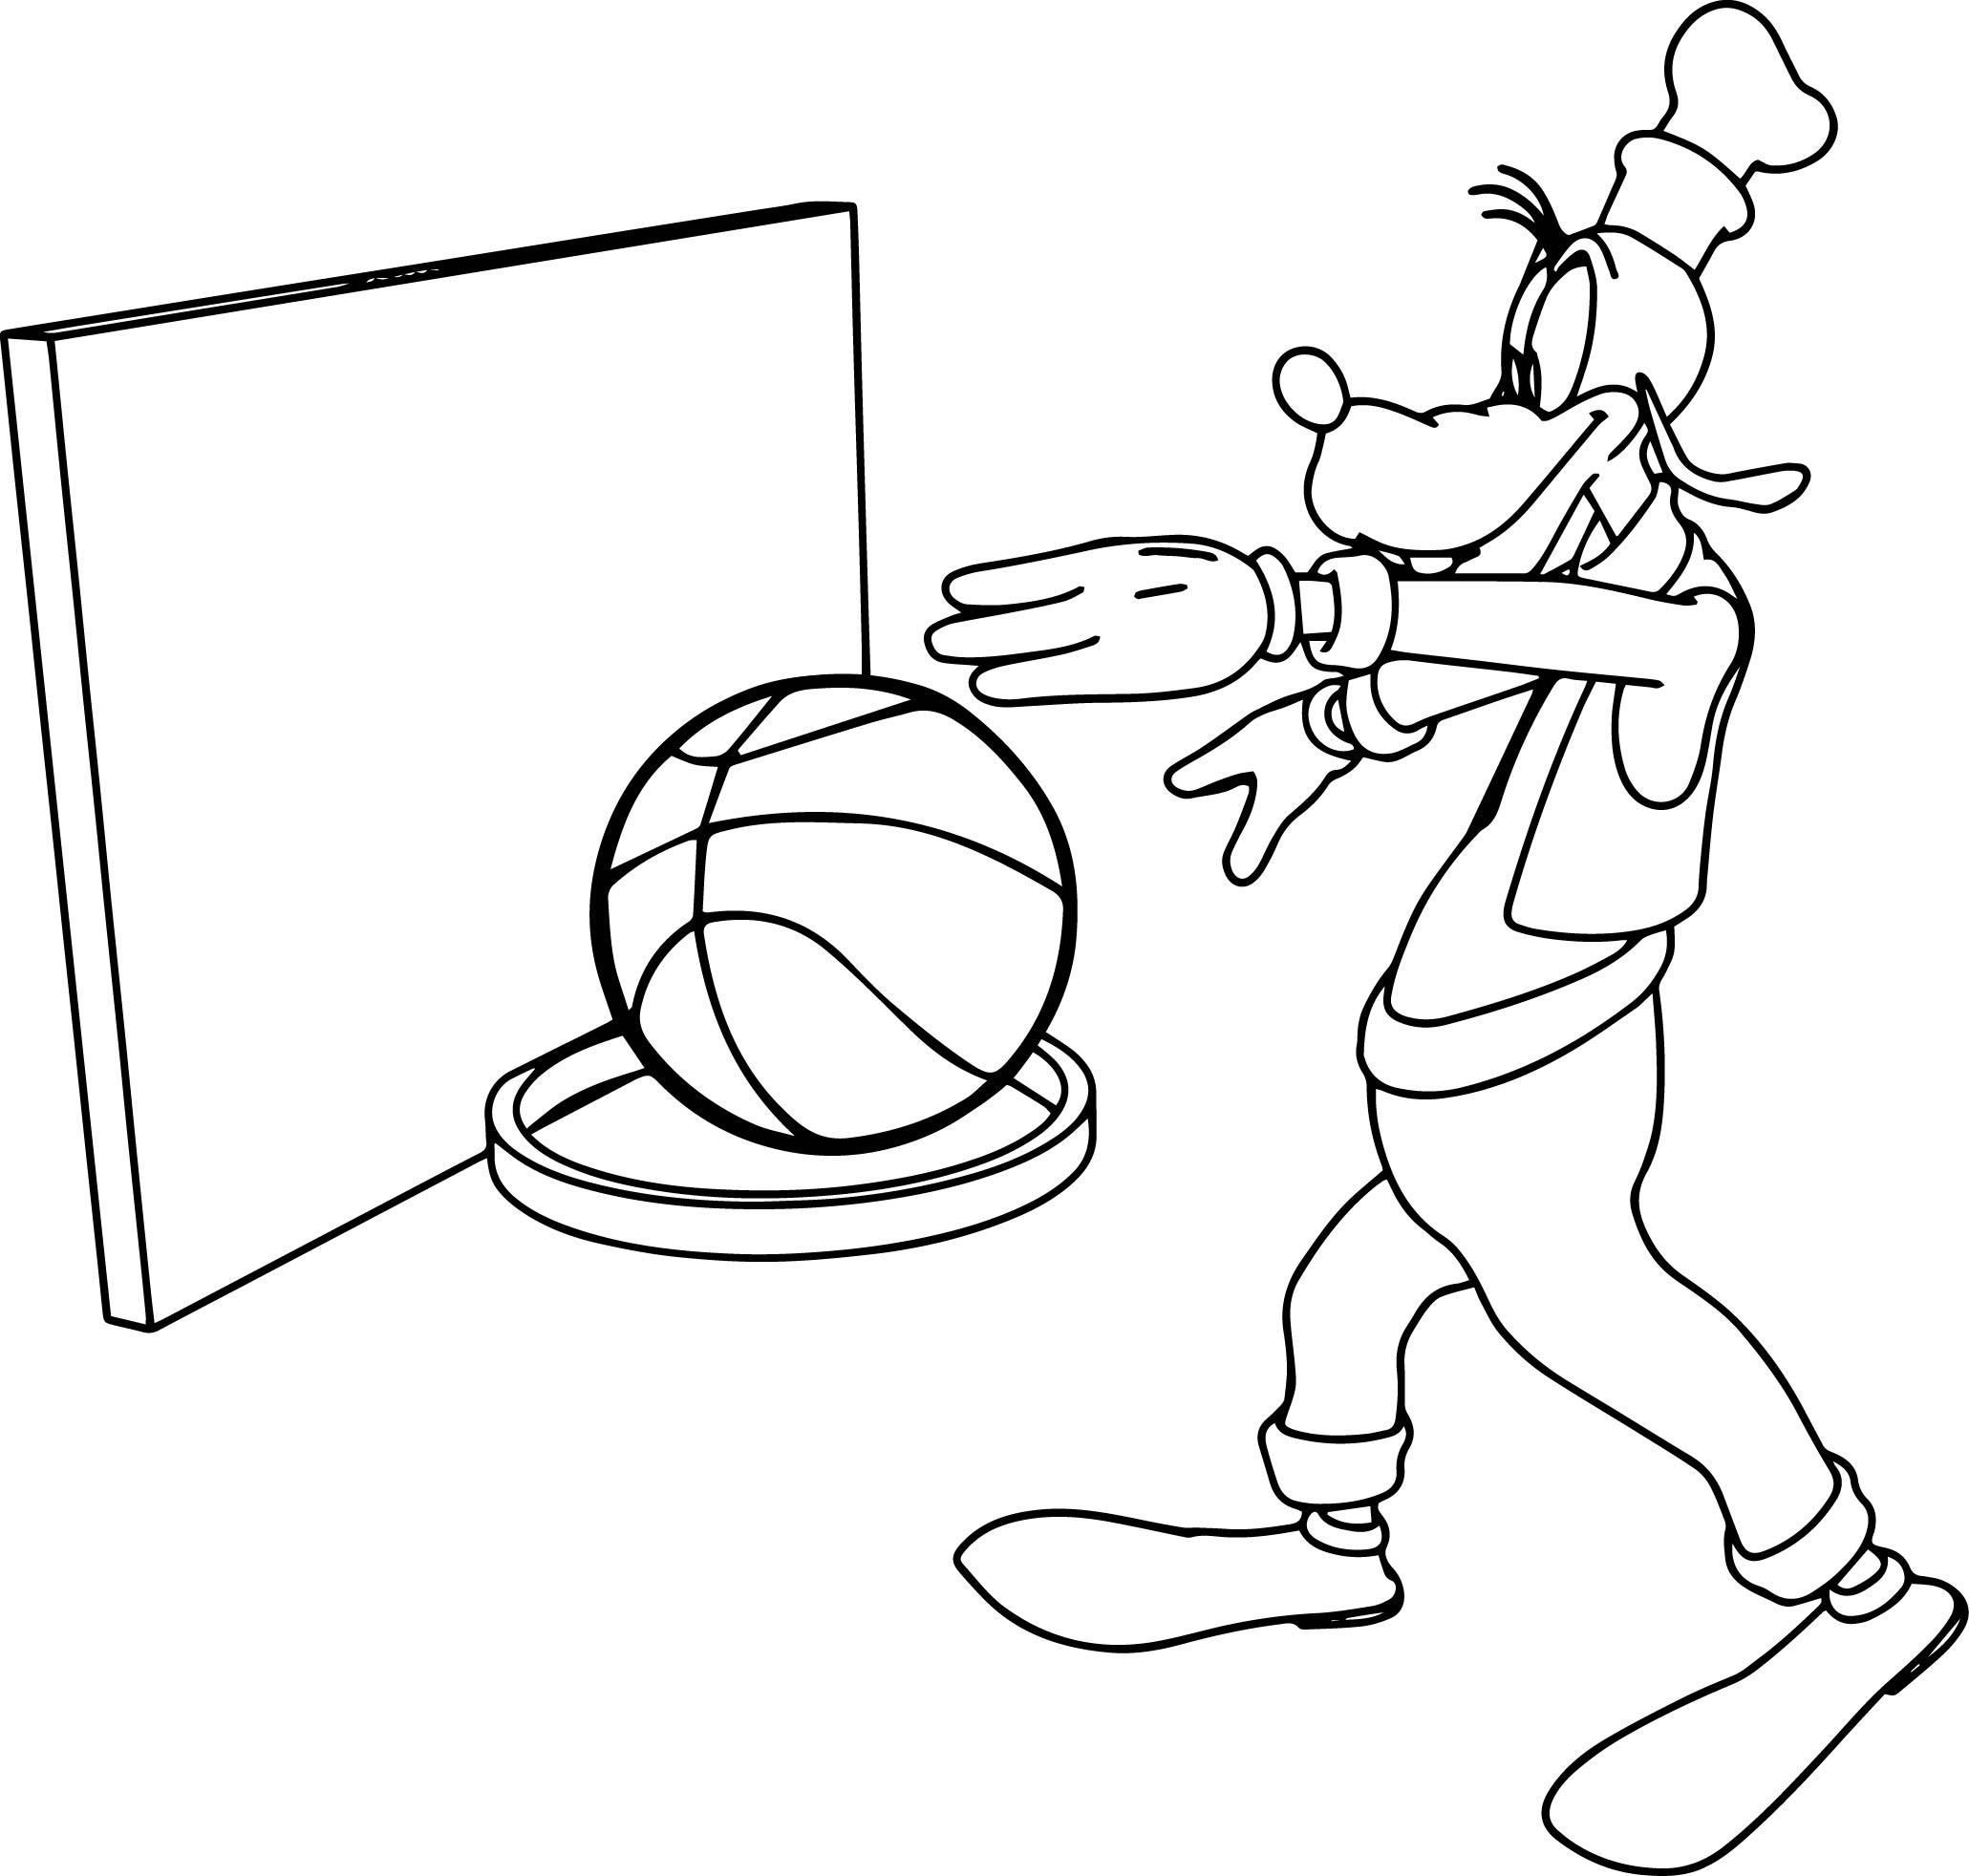 goofy basketball coloring page wecoloringpage